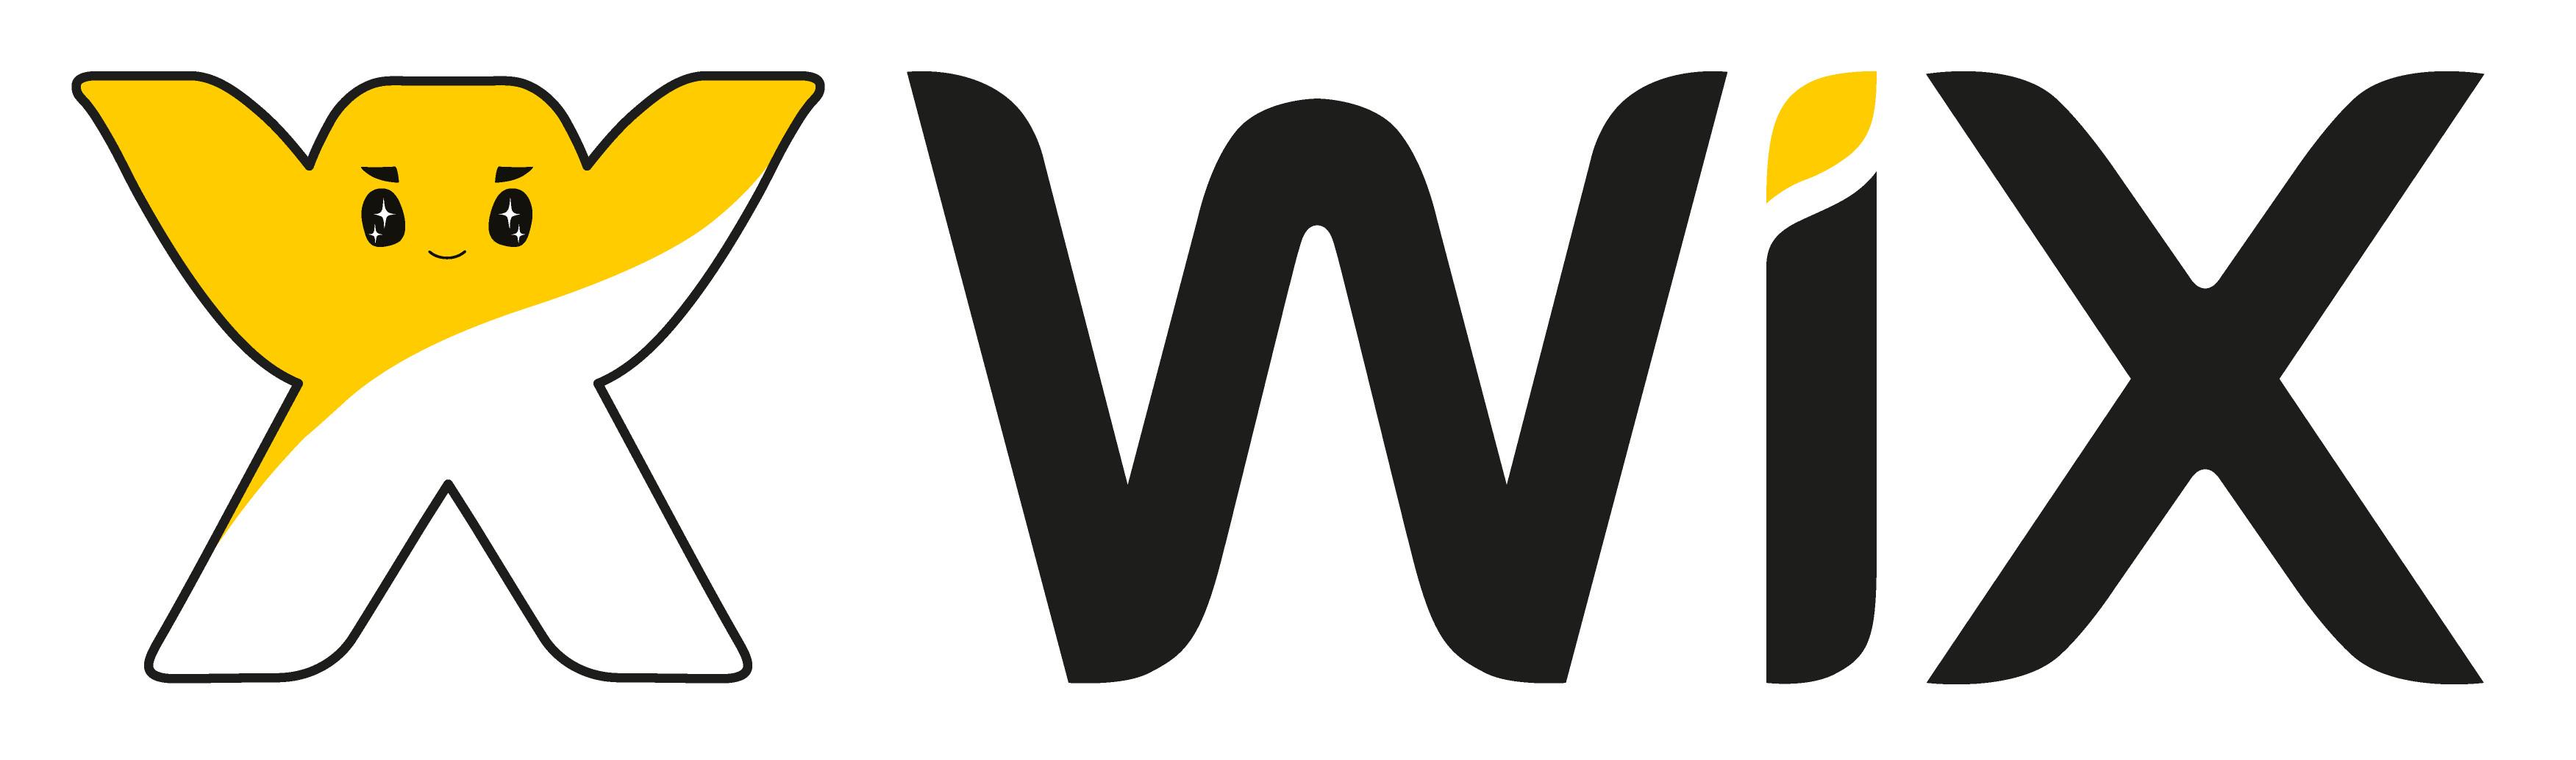 Wix.com Unveils Its #StartStunning Super Bowl Commercial Online